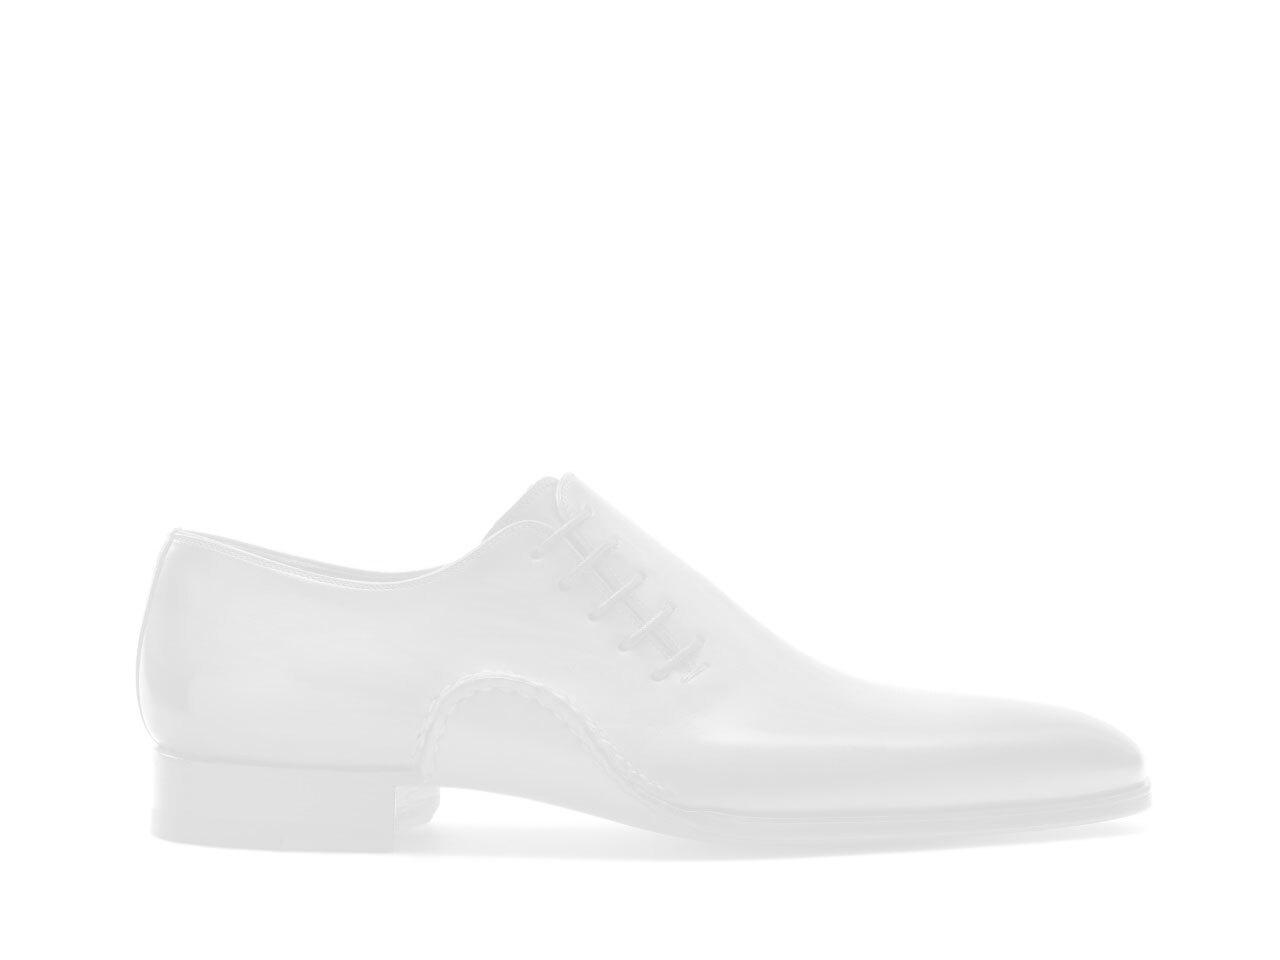 Black leather single monk strap shoes for men - Magnanni